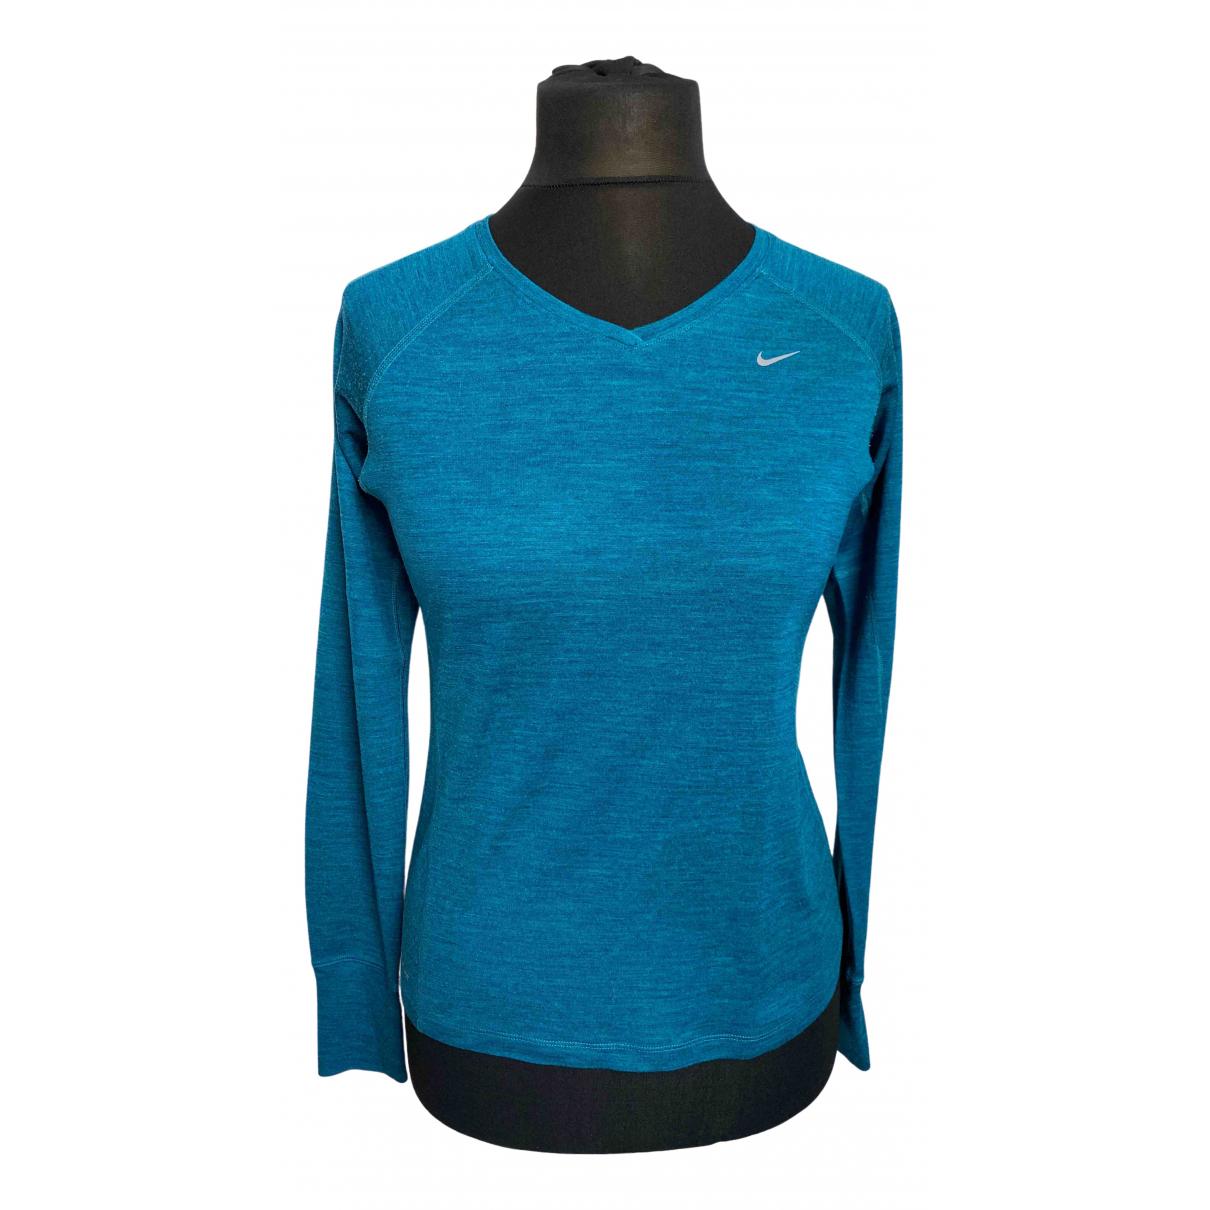 Nike - Top   pour femme - vert